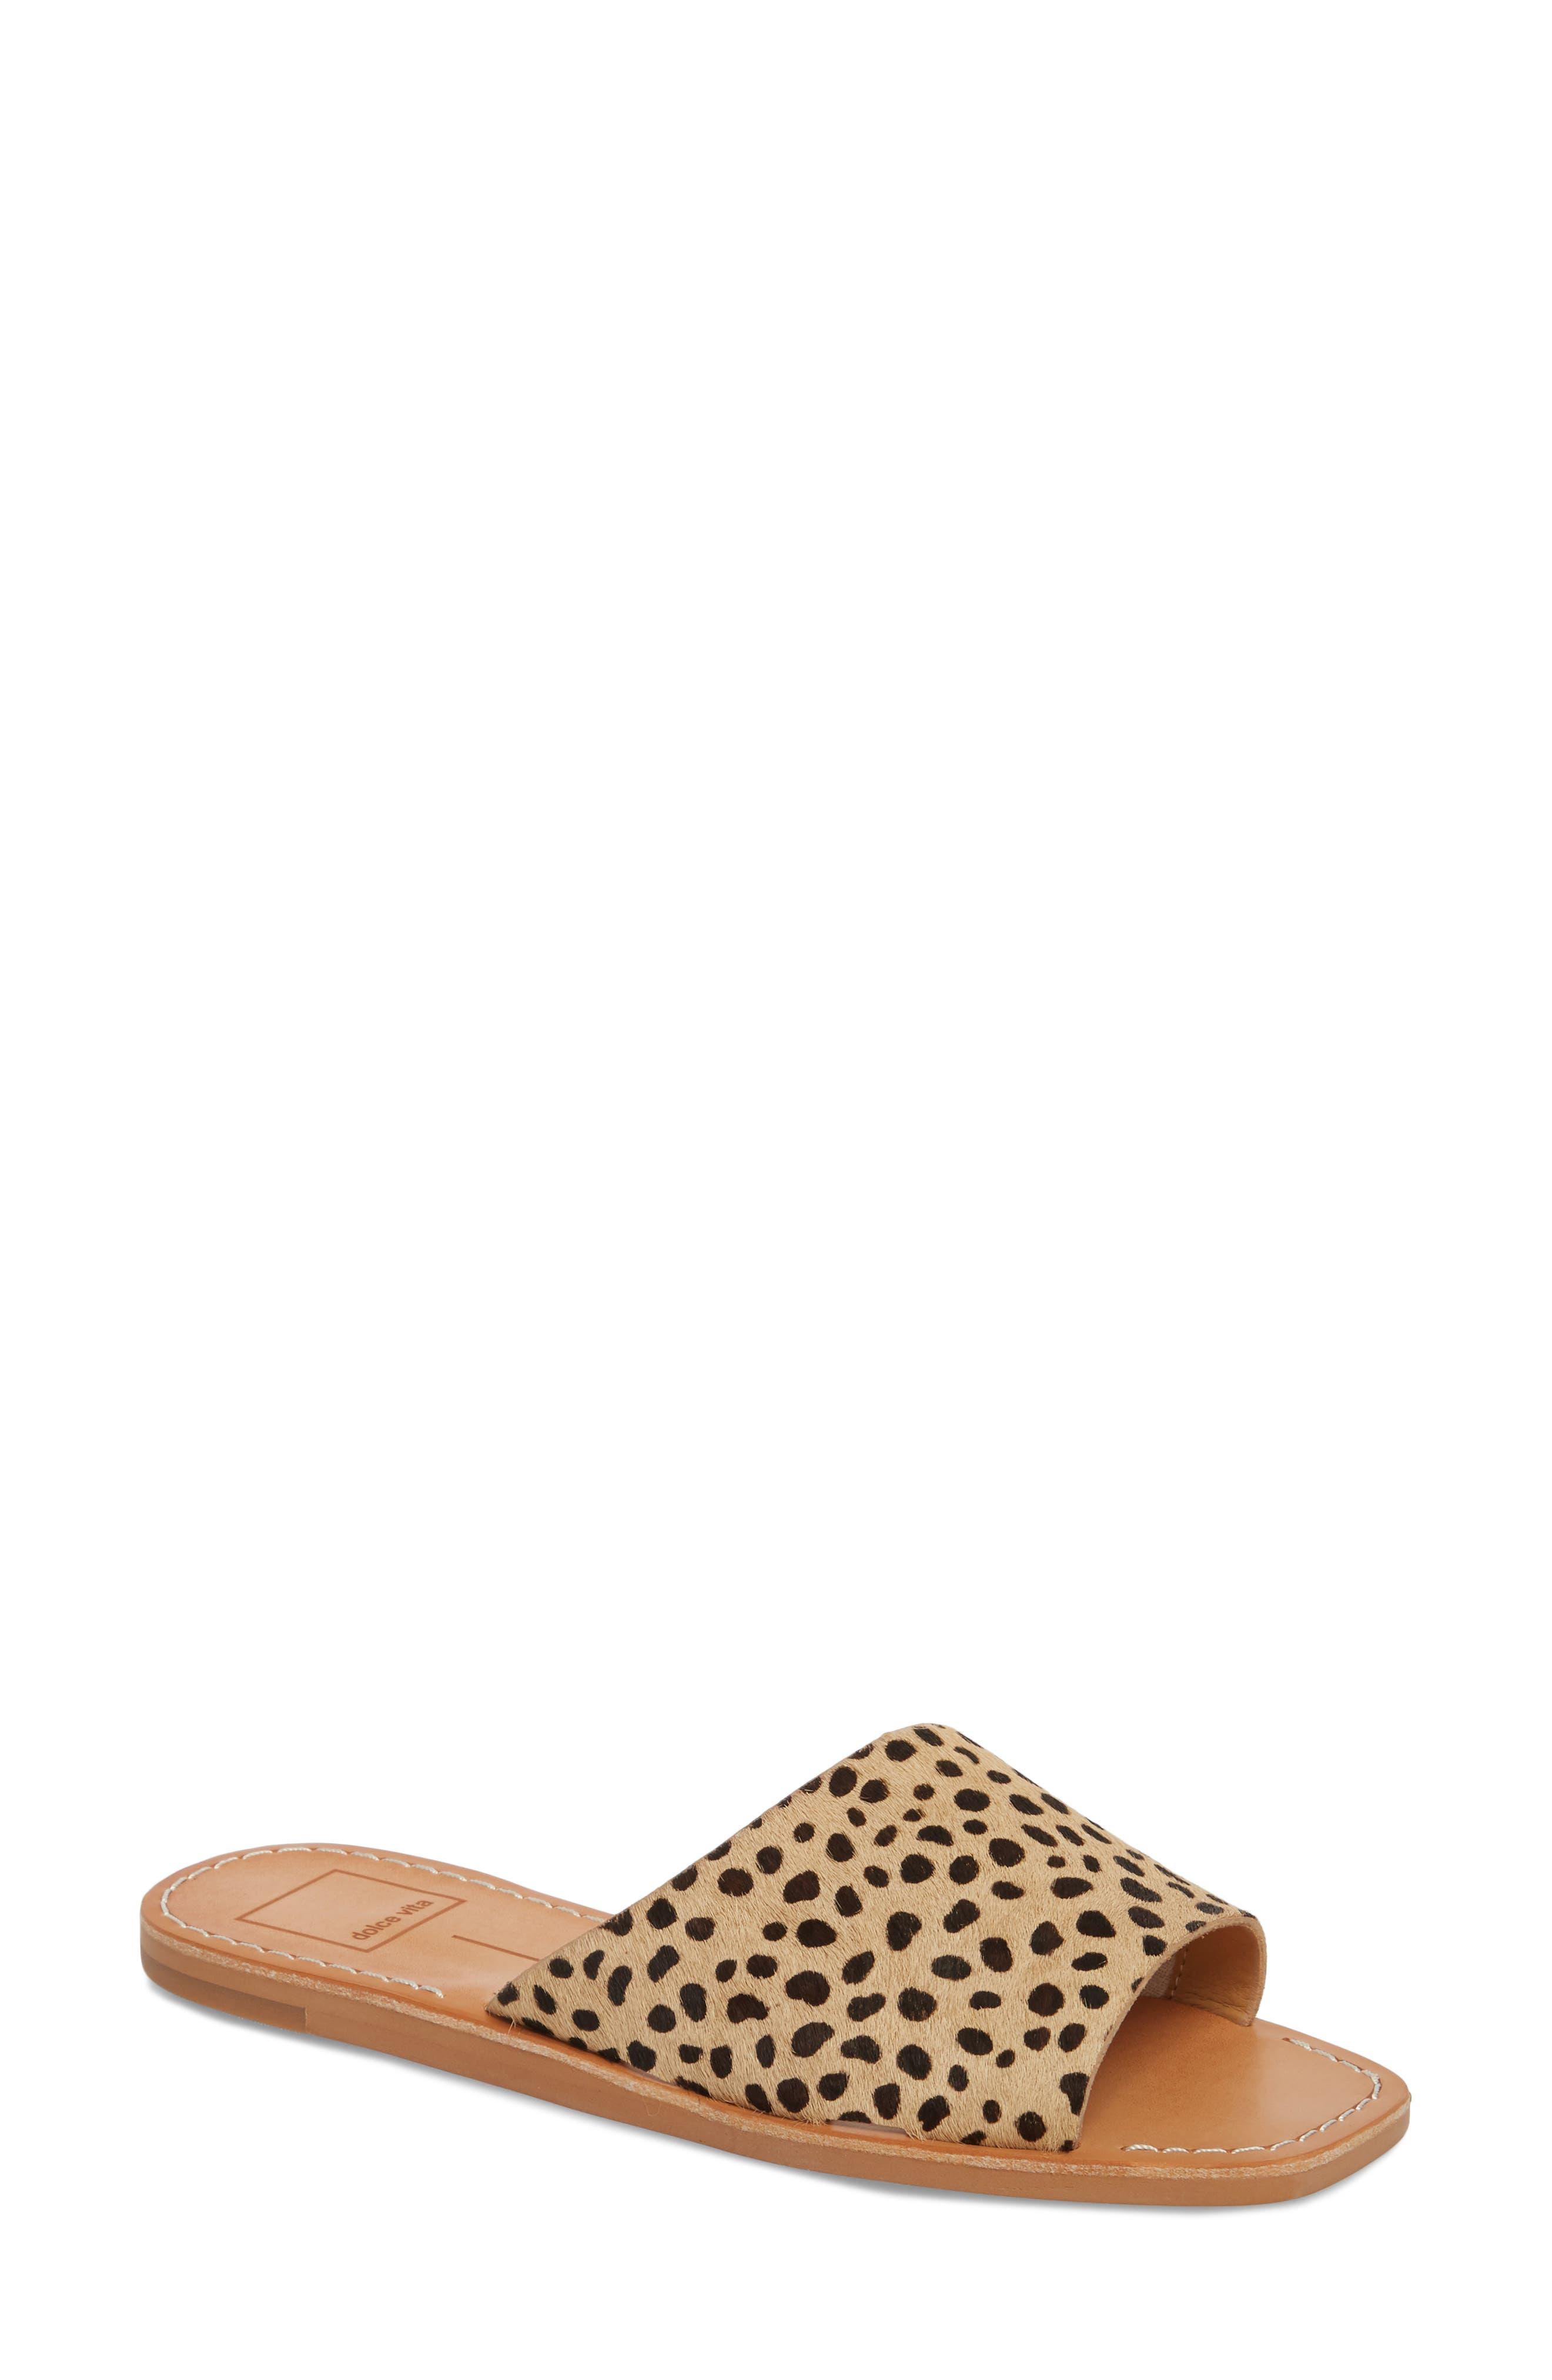 Cato Genuine Calf Hair Slide Sandal,                         Main,                         color, Leopard Calf Hair